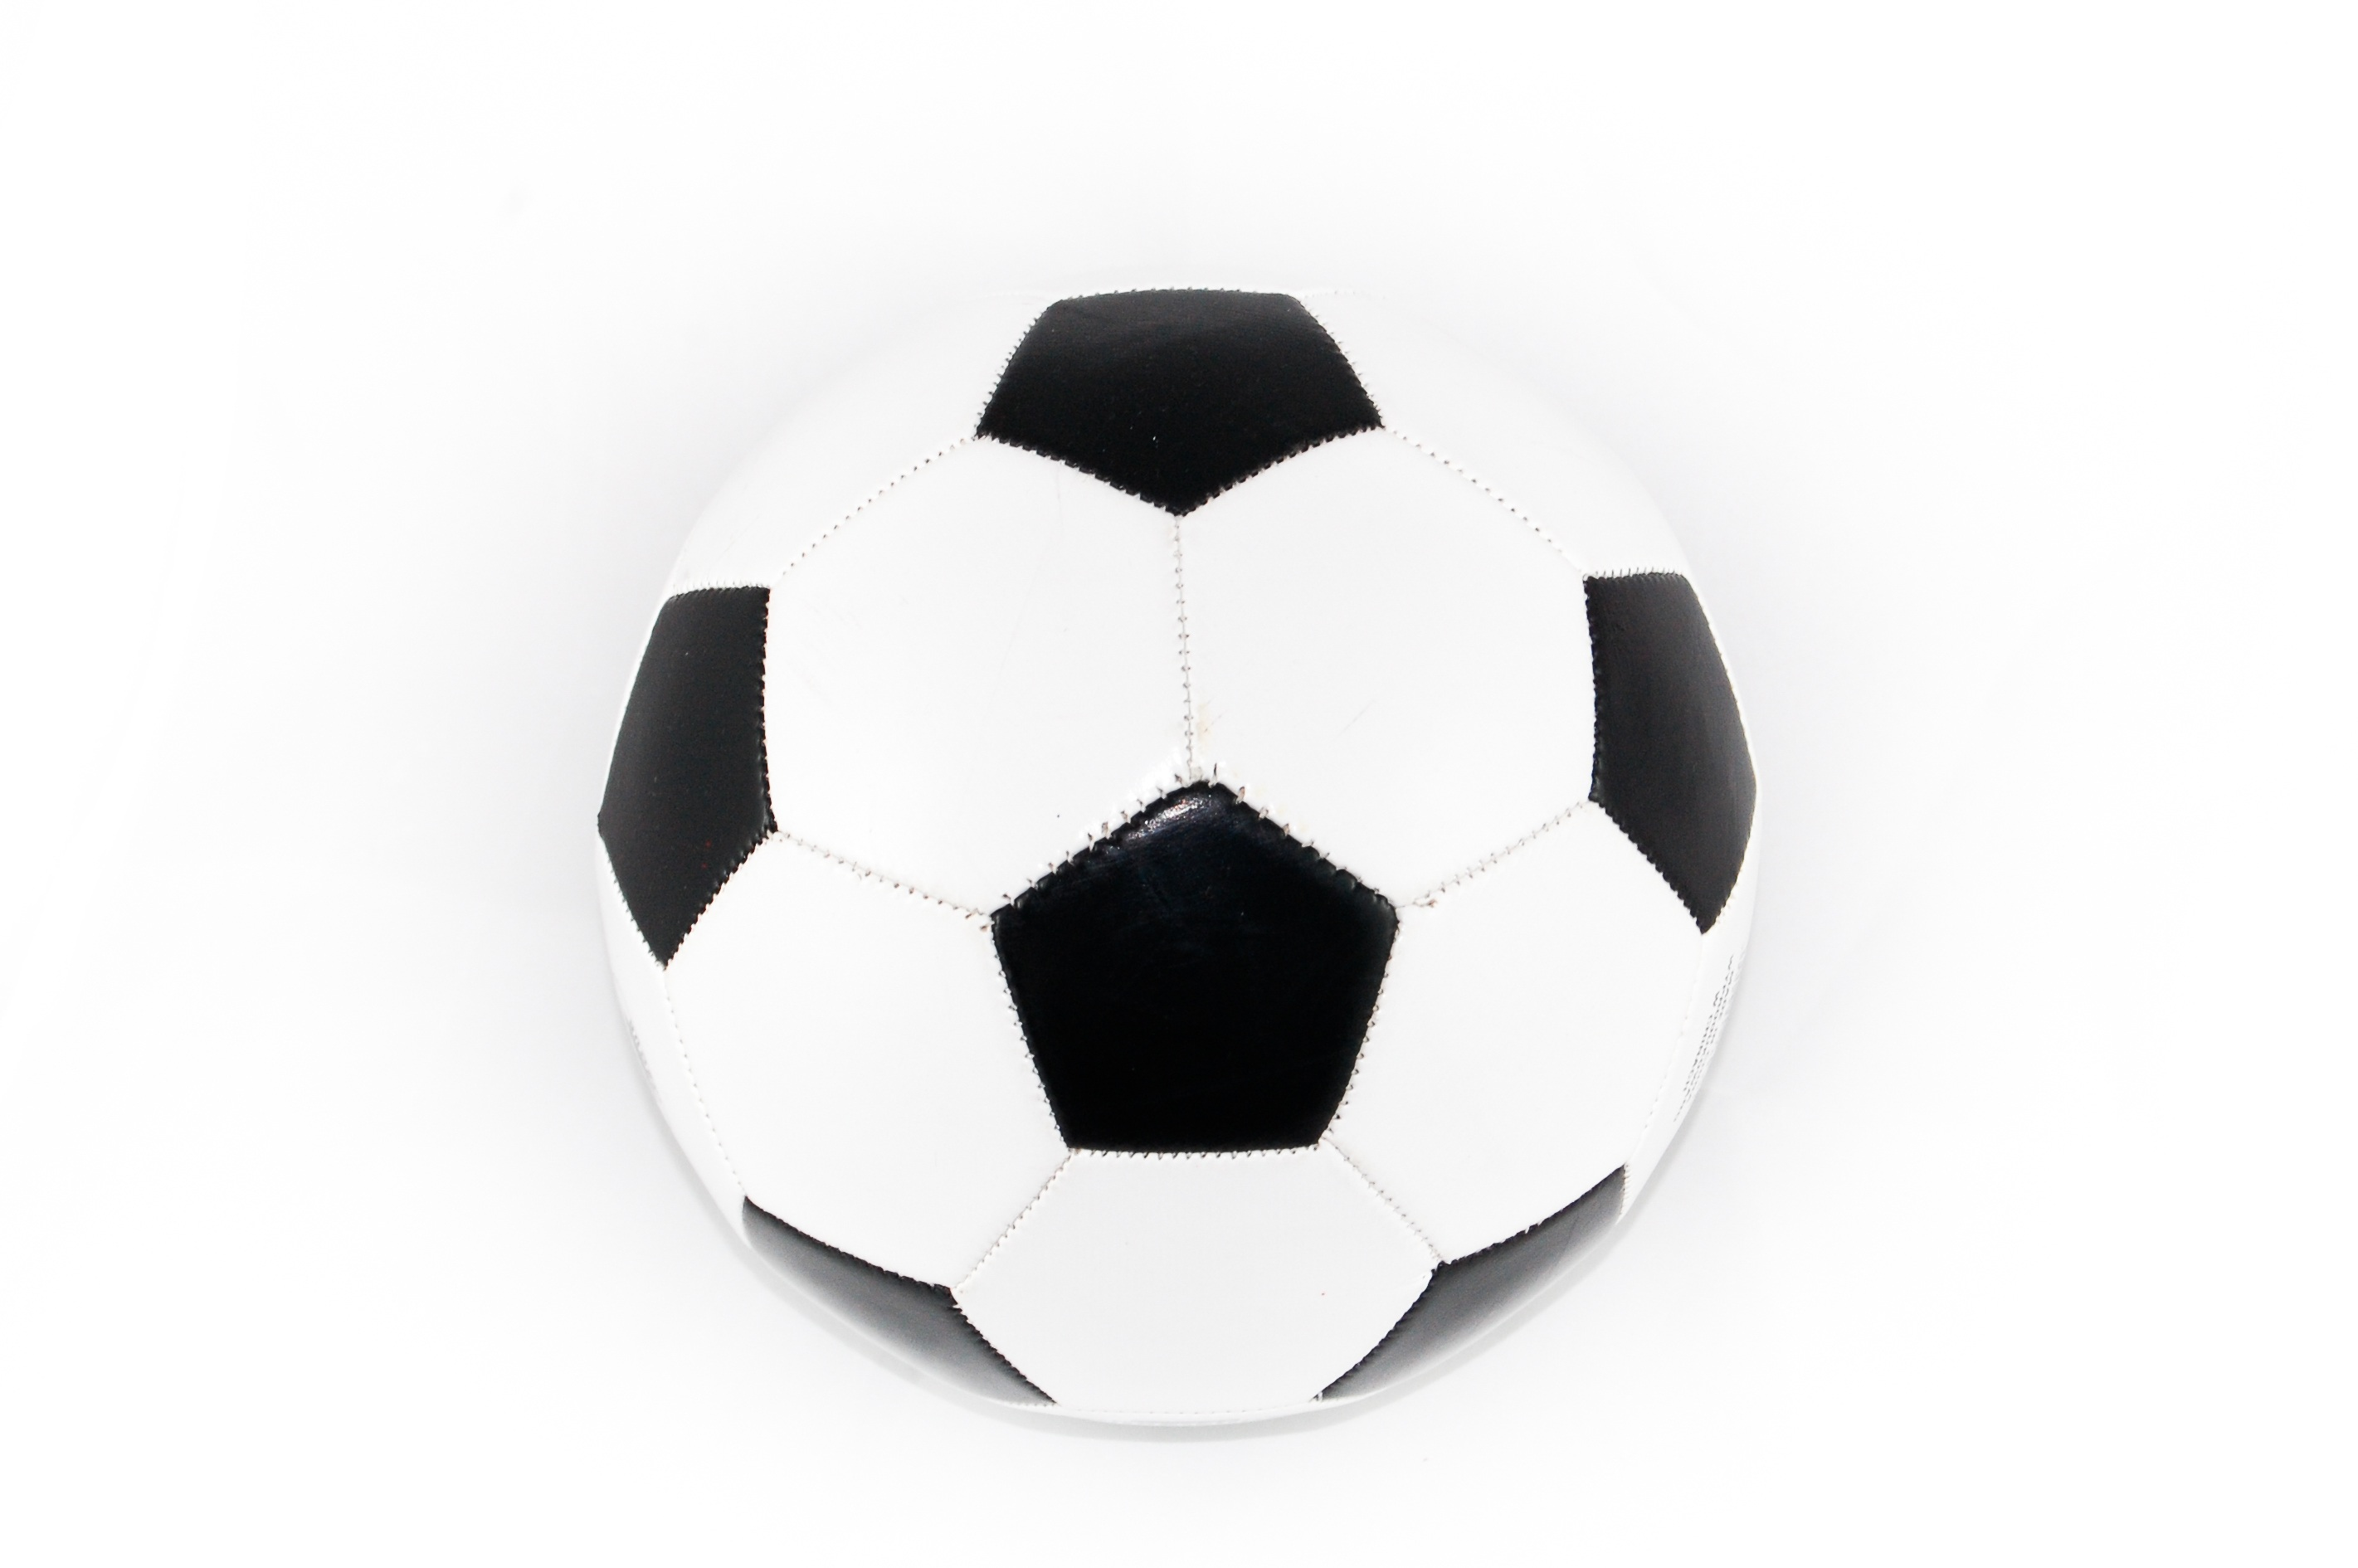 2842x1890 Free Stock Photos Of Soccer Ball Pexels